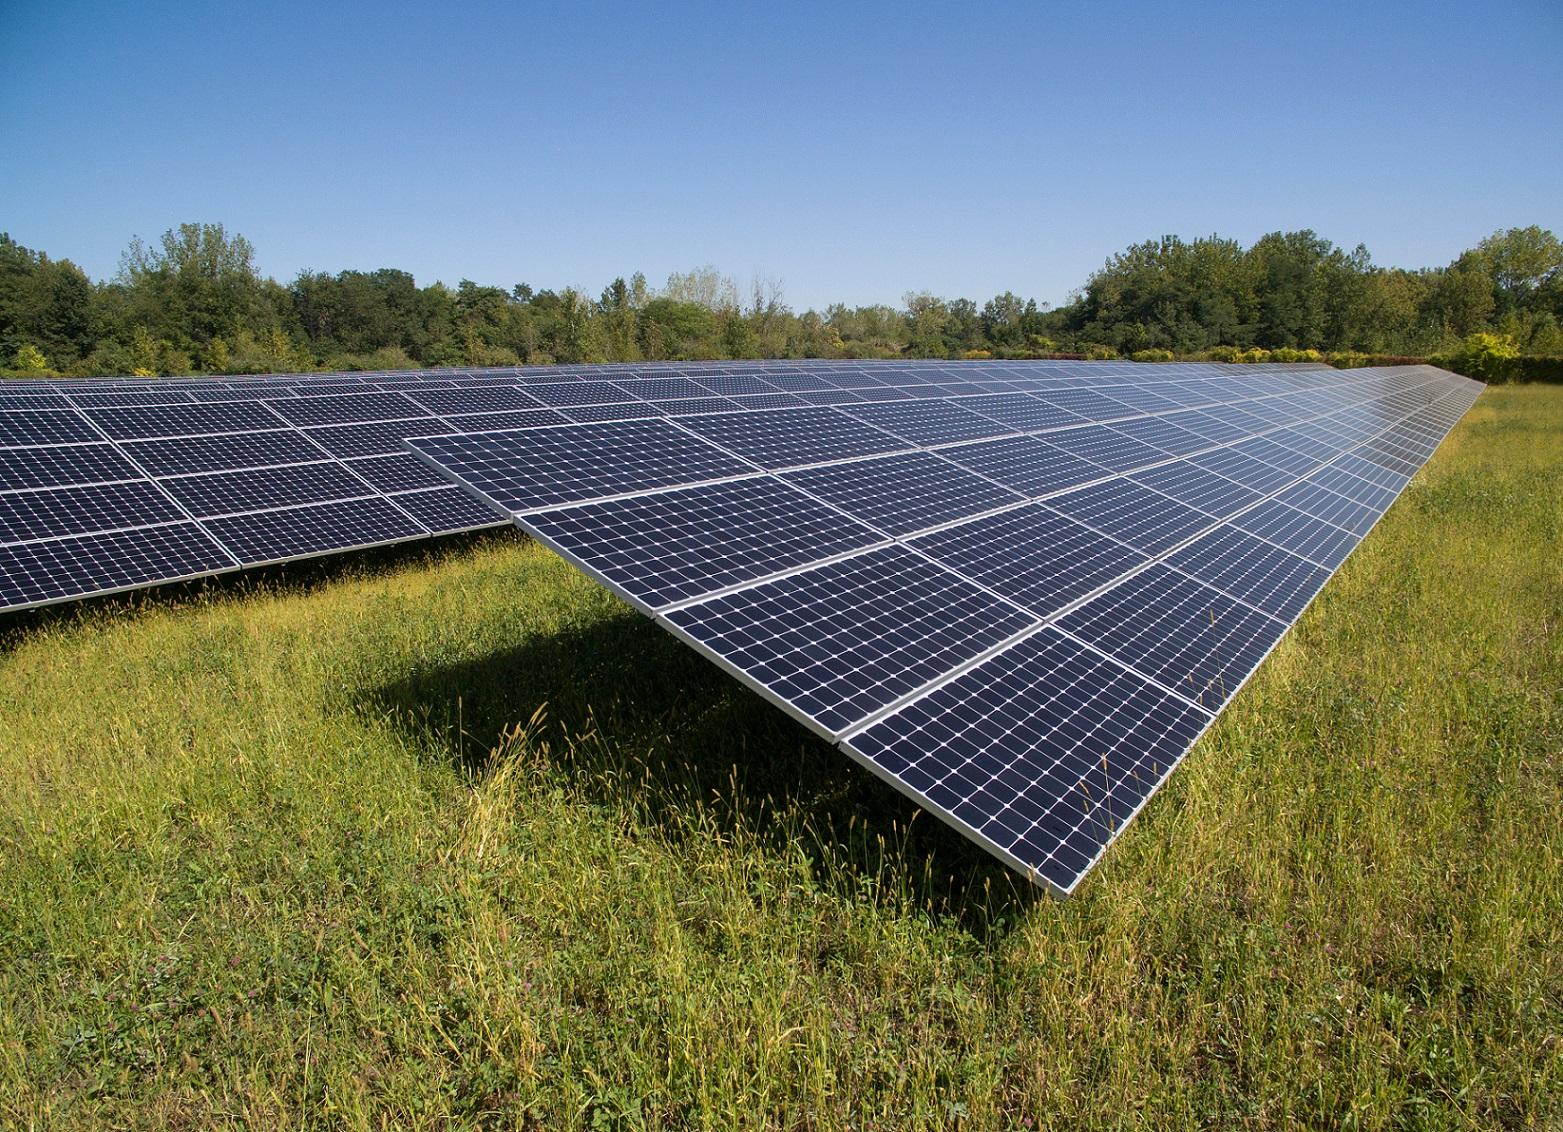 Utility solar installation by SunPower in a grassy field.